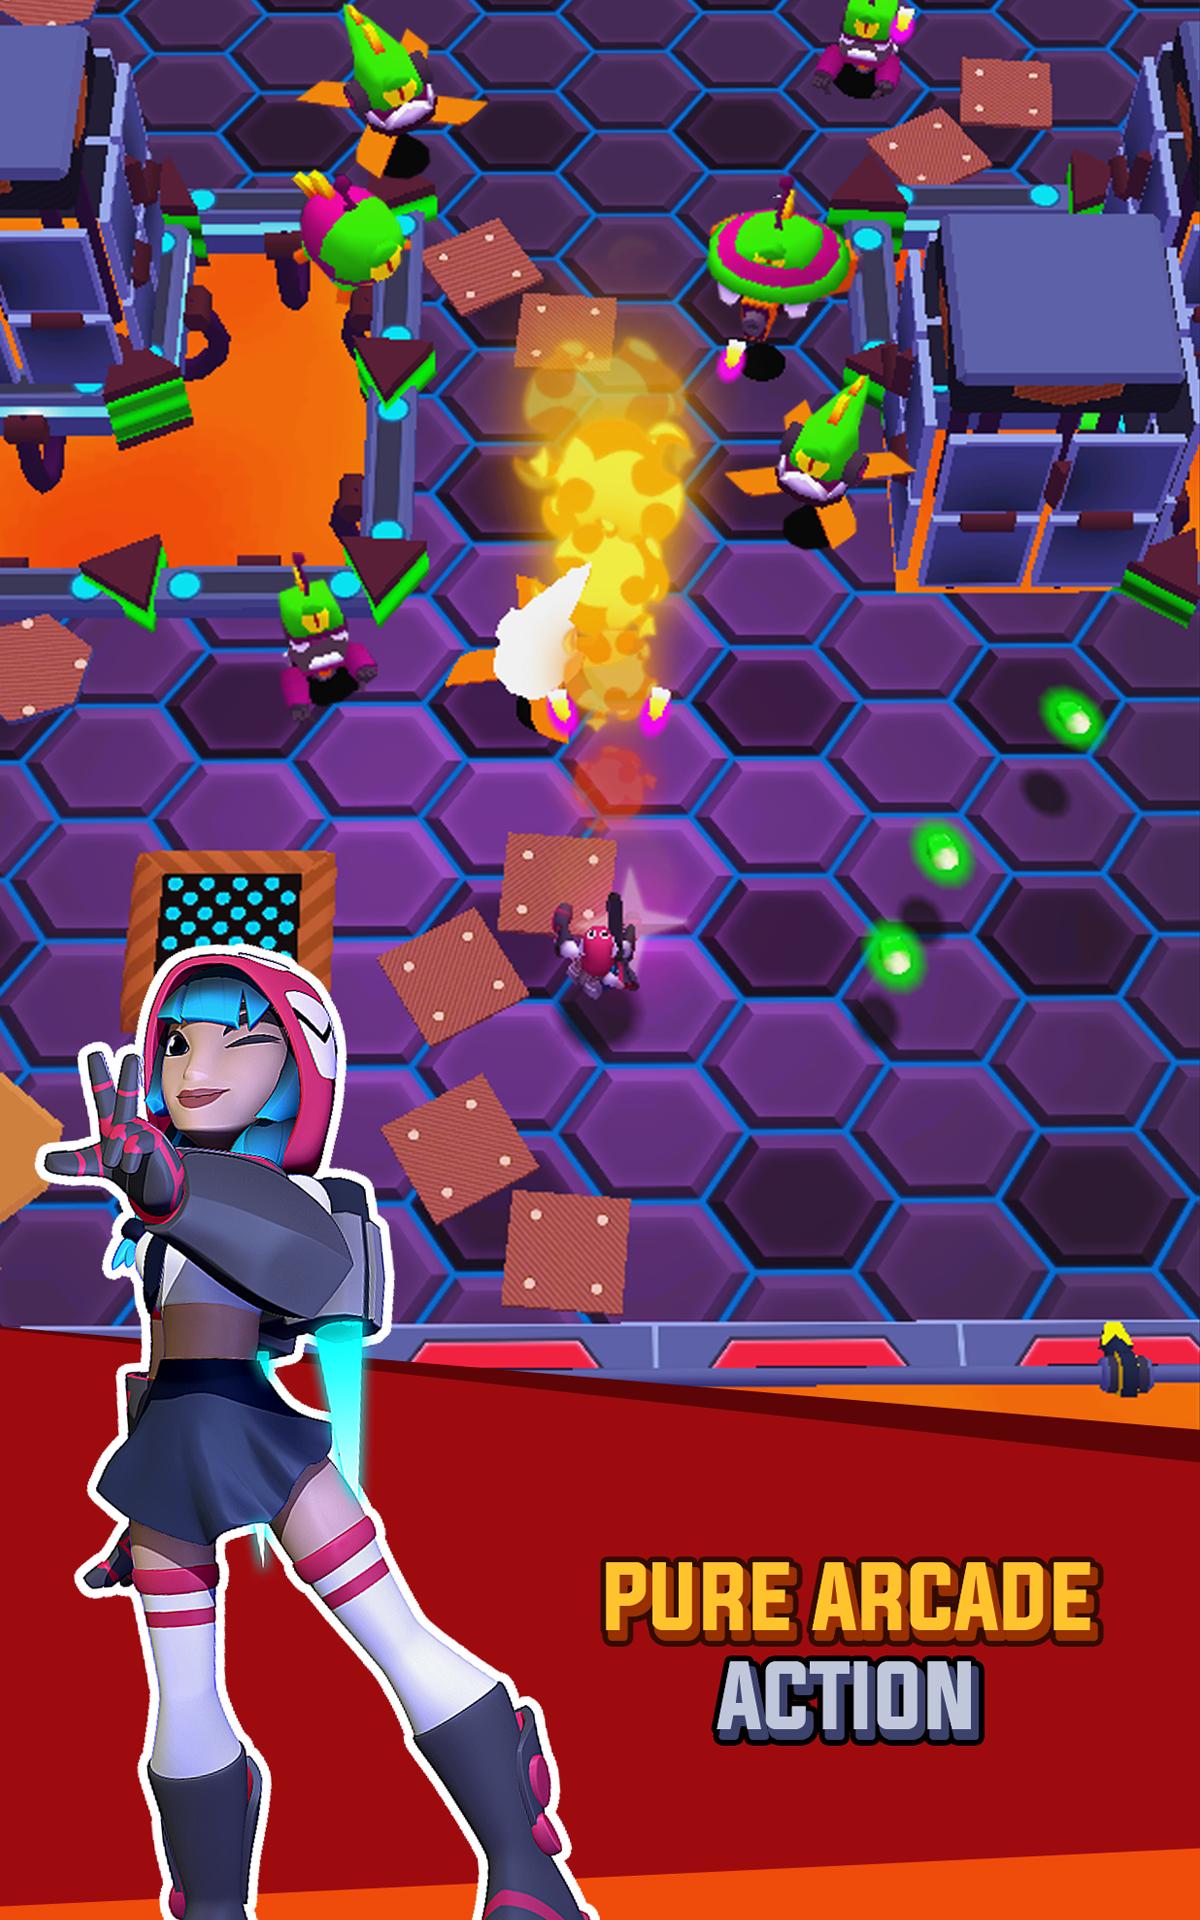 Frantic Shooter screenshot #12